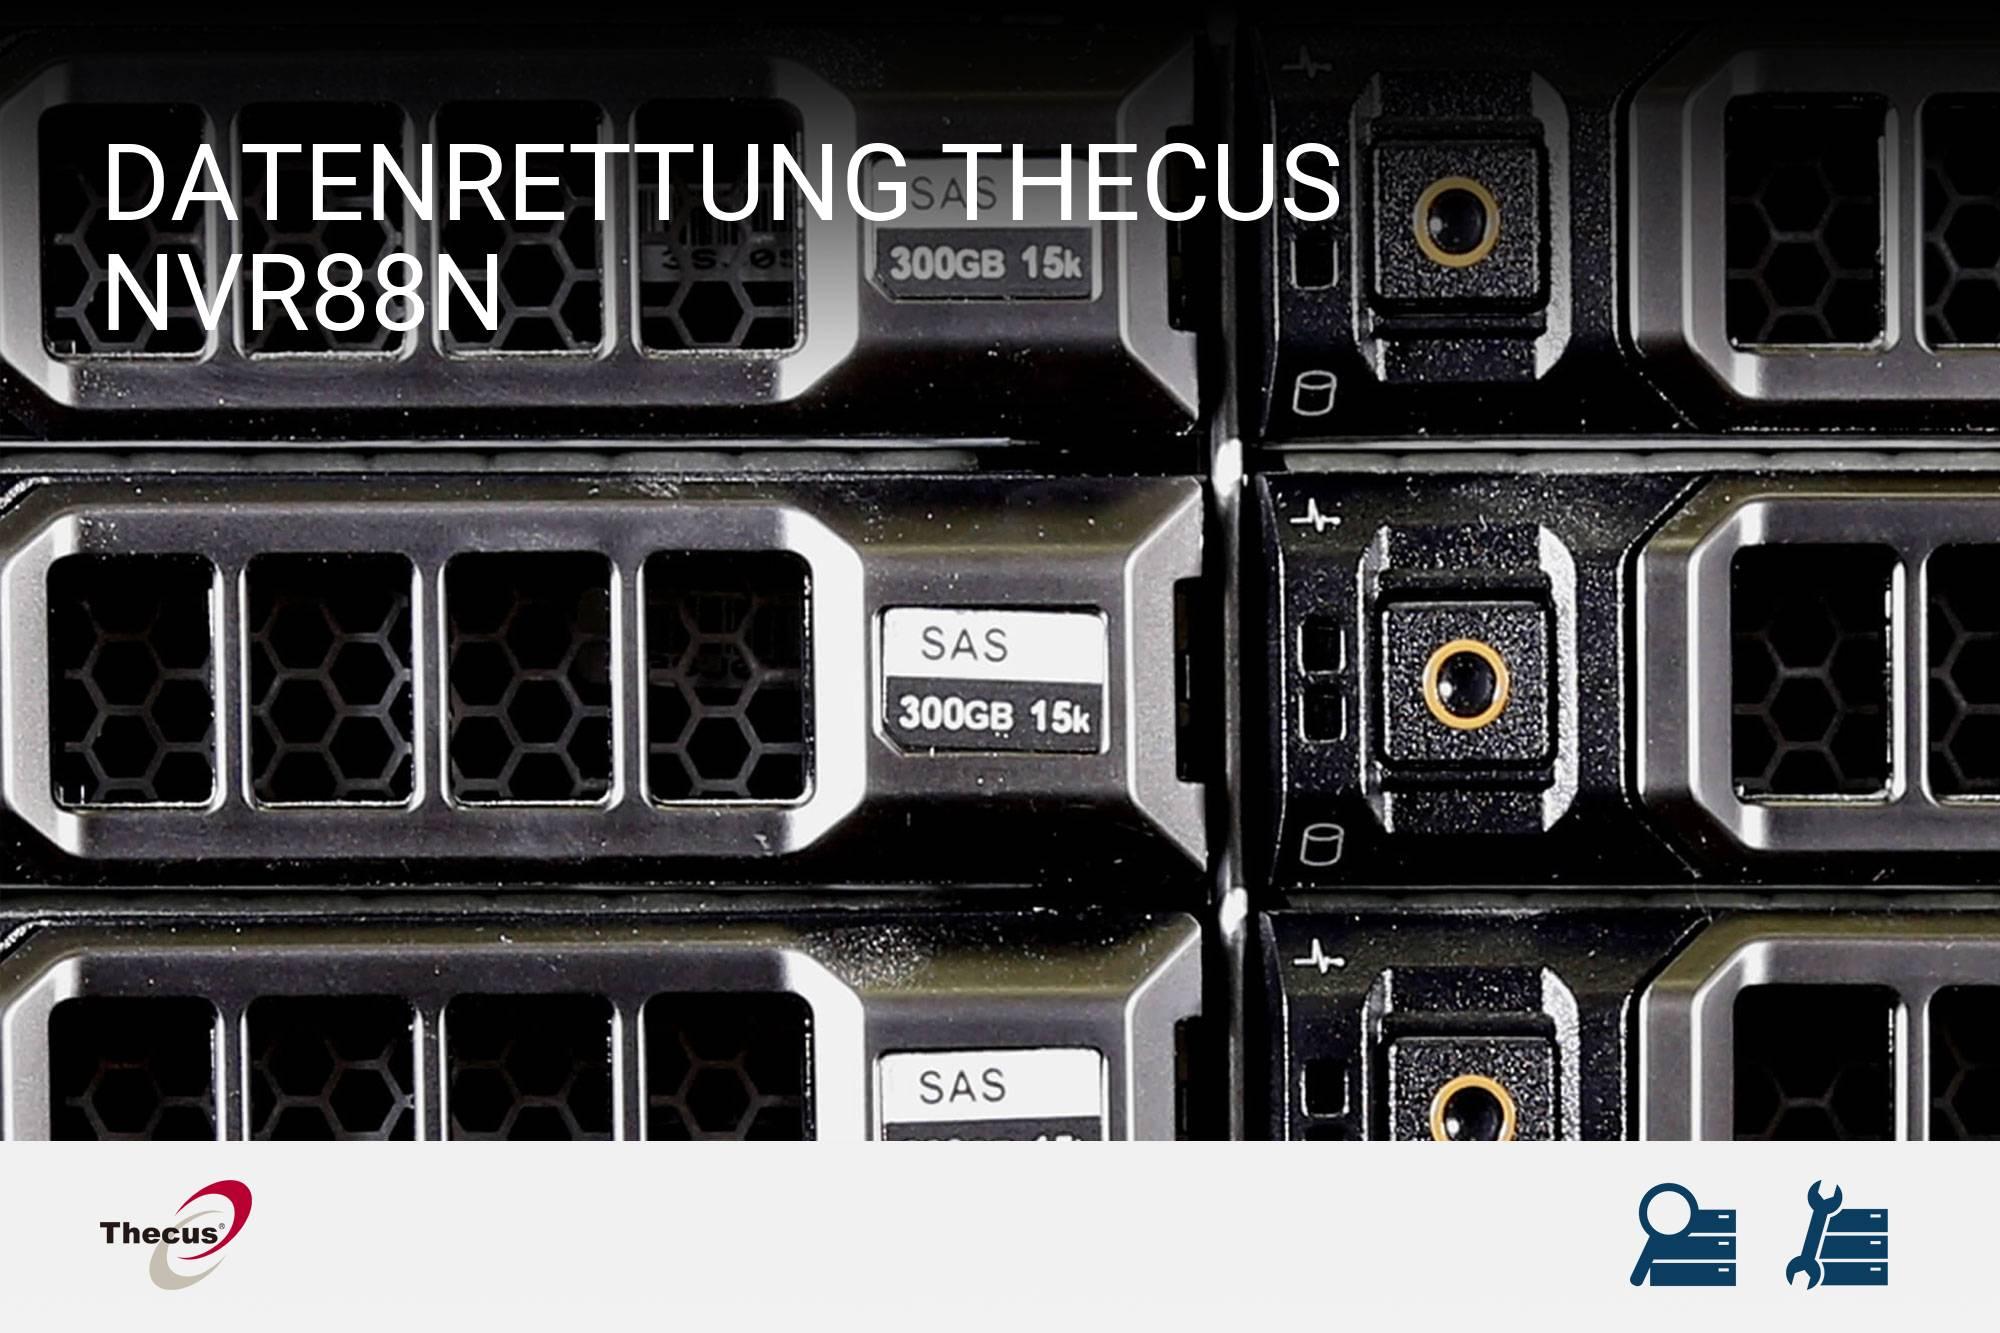 Thecus NVR88N